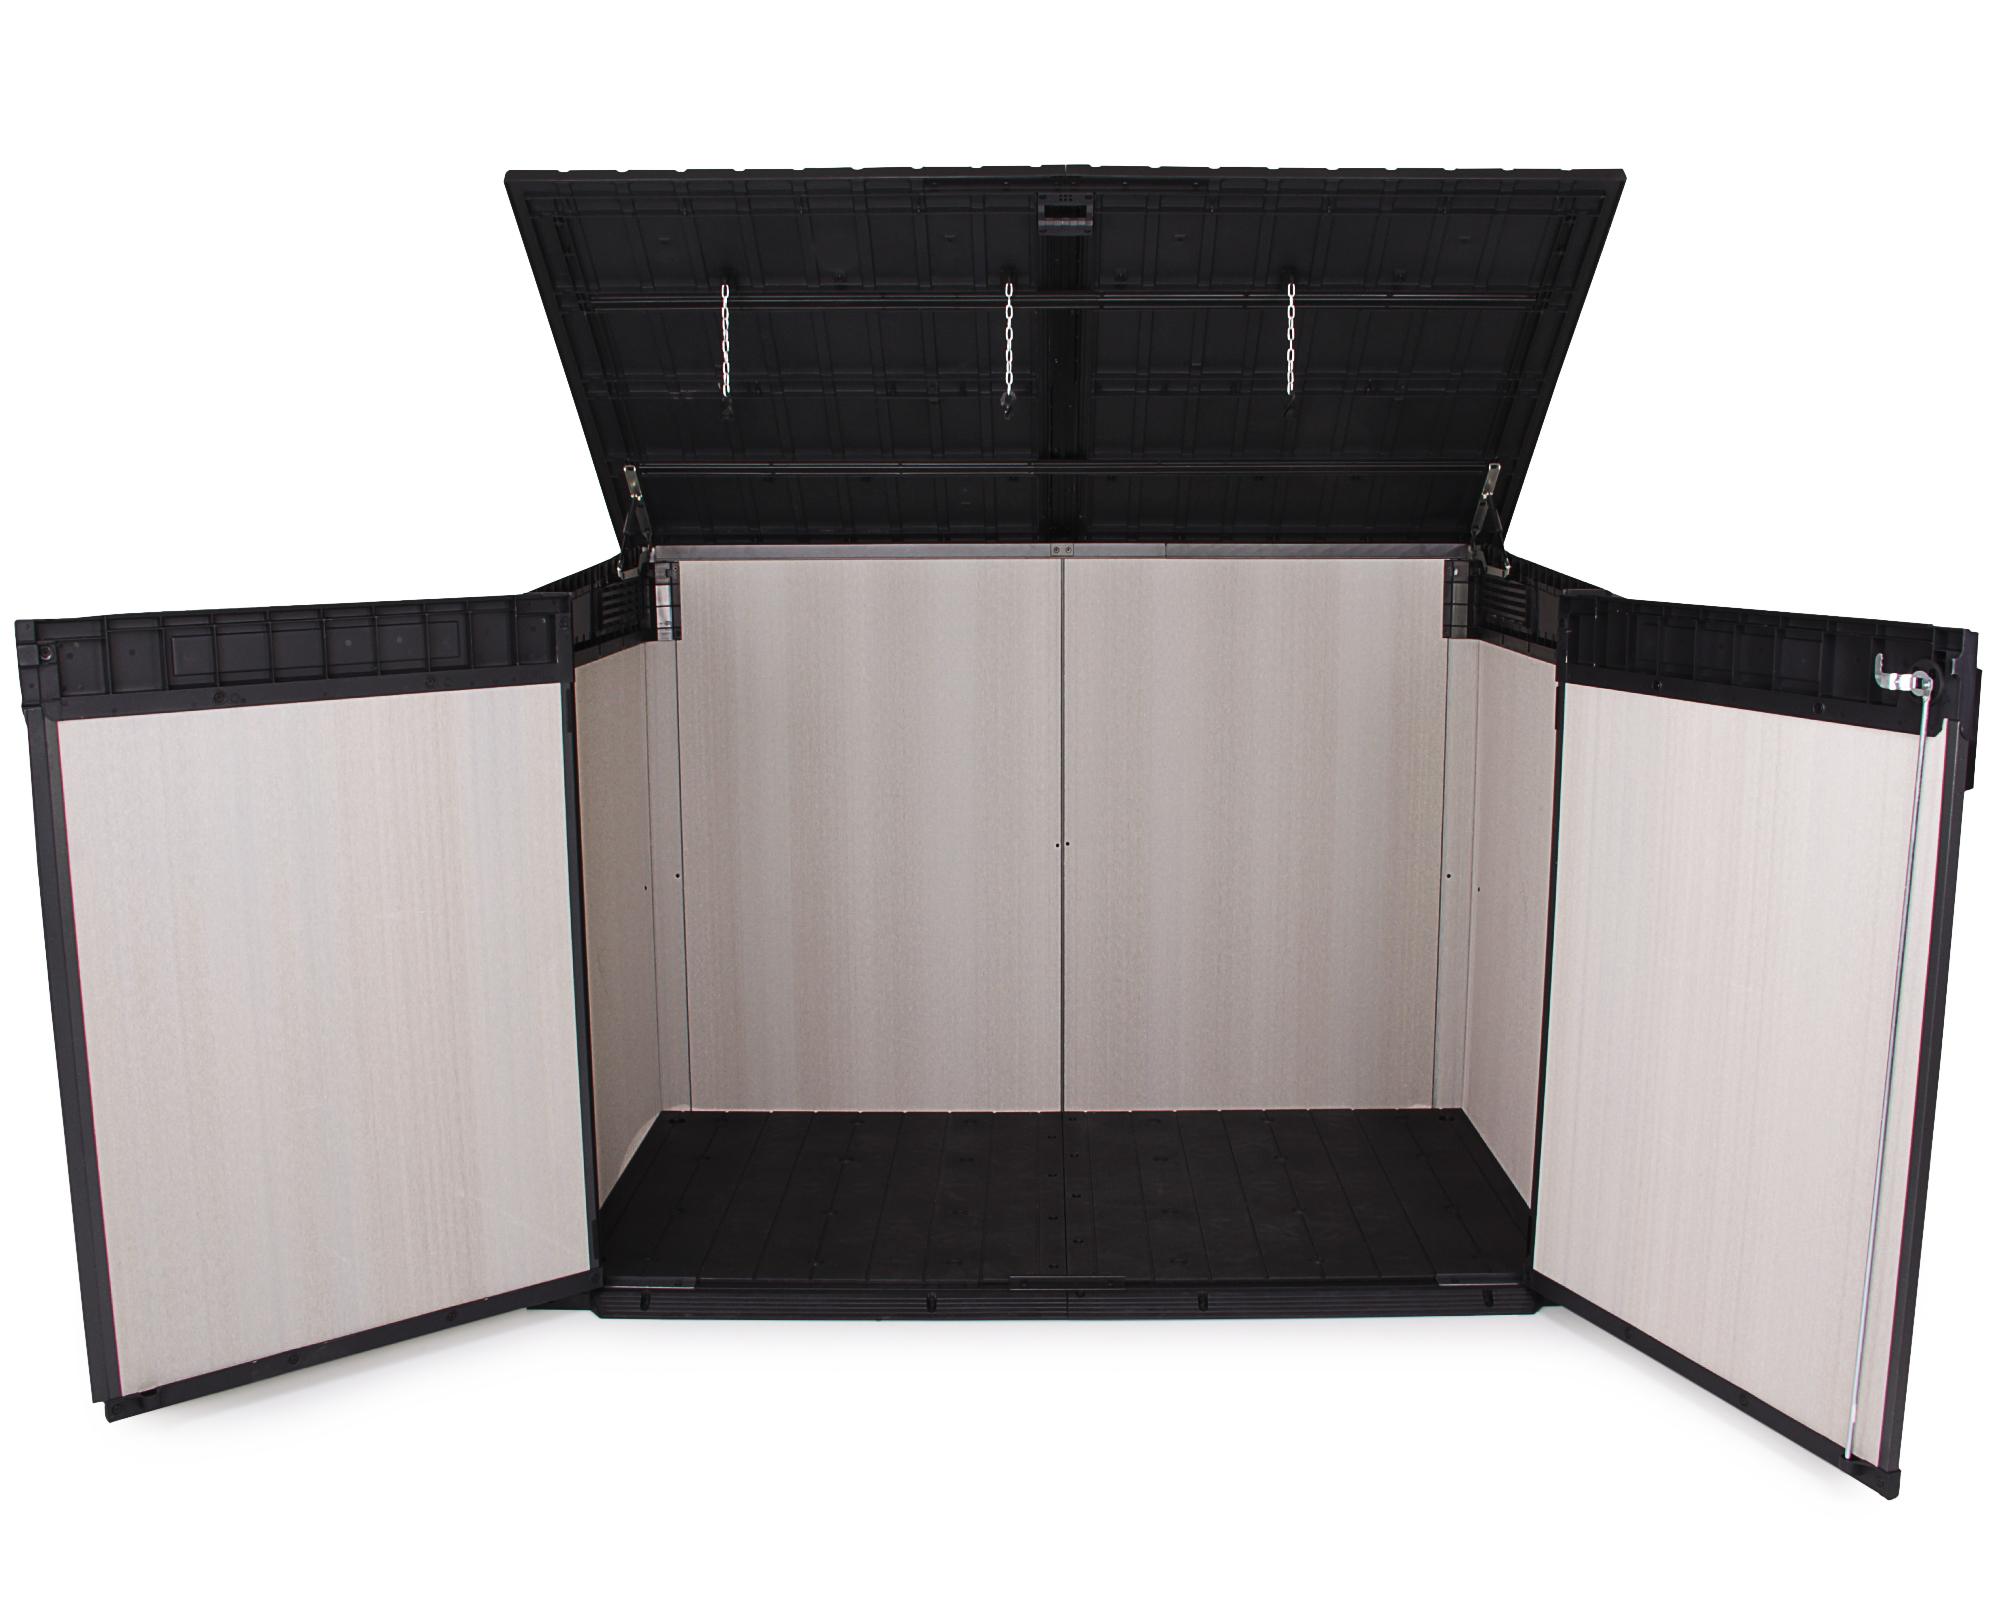 ondis24 keter grande store gartenbox ger teschuppen xxl g nstig online kaufen. Black Bedroom Furniture Sets. Home Design Ideas